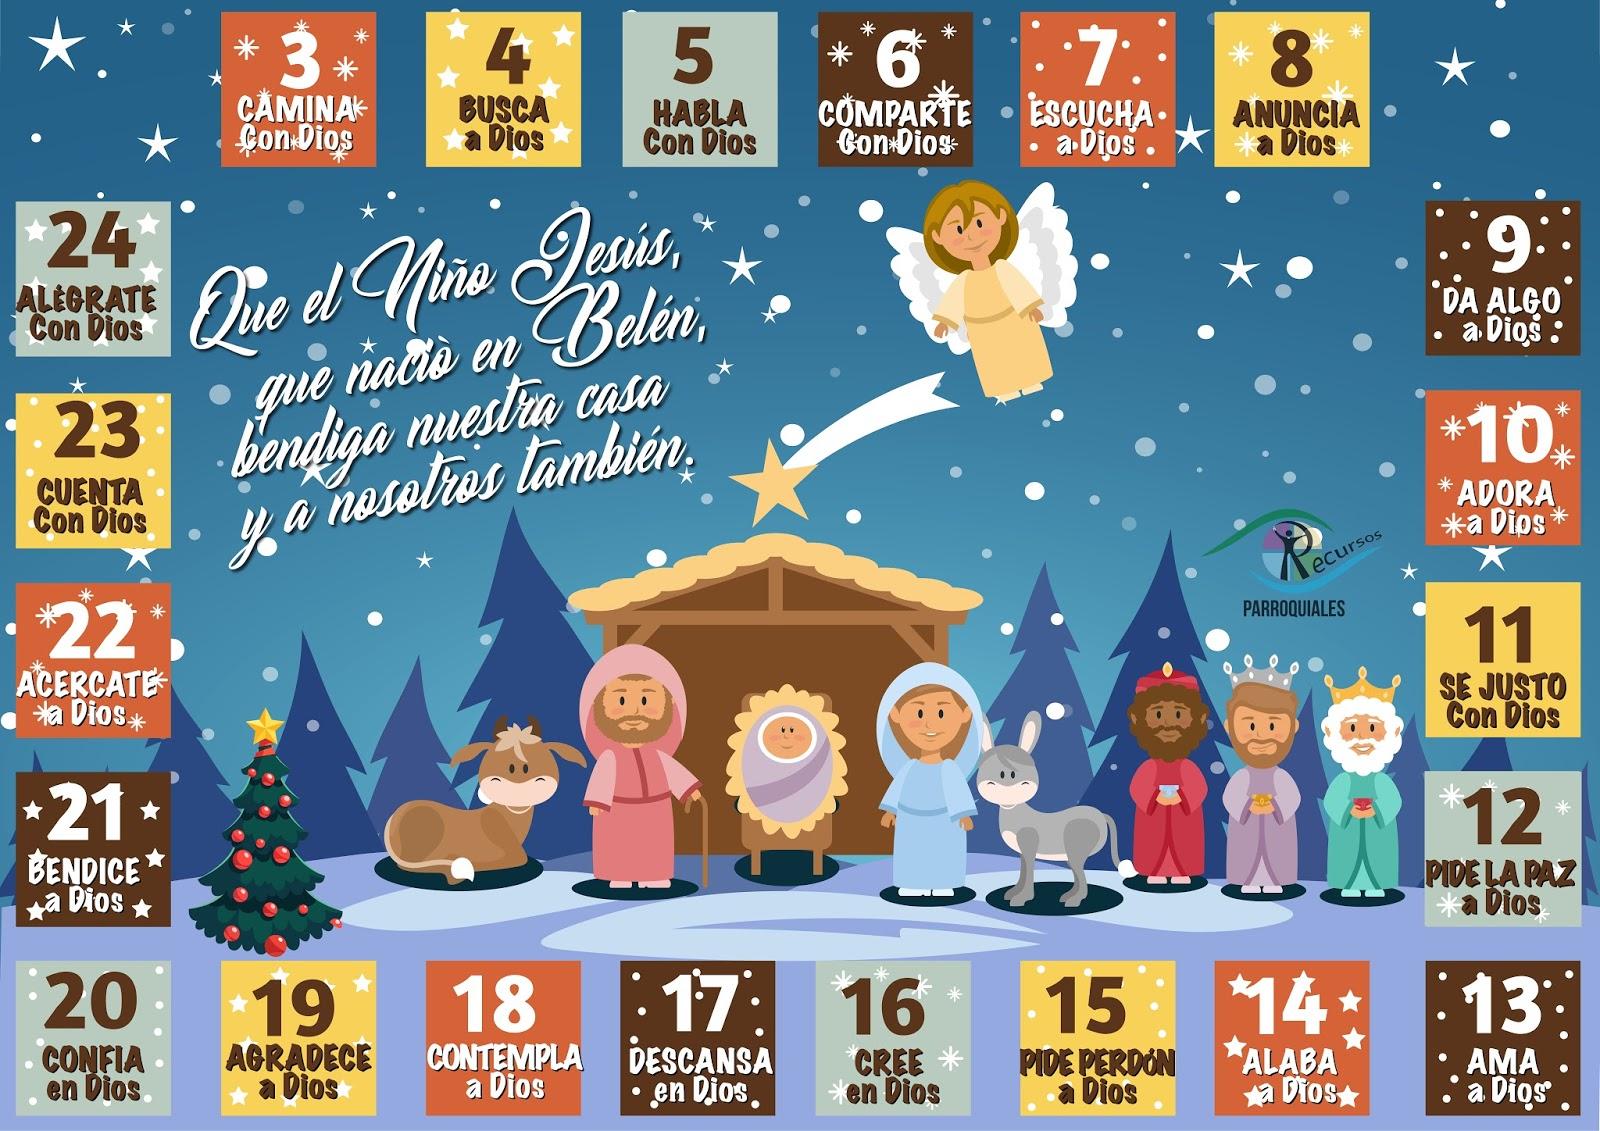 Calendario de adviento delegaci n de catequesis de zaragoza for Calendario adviento 2017